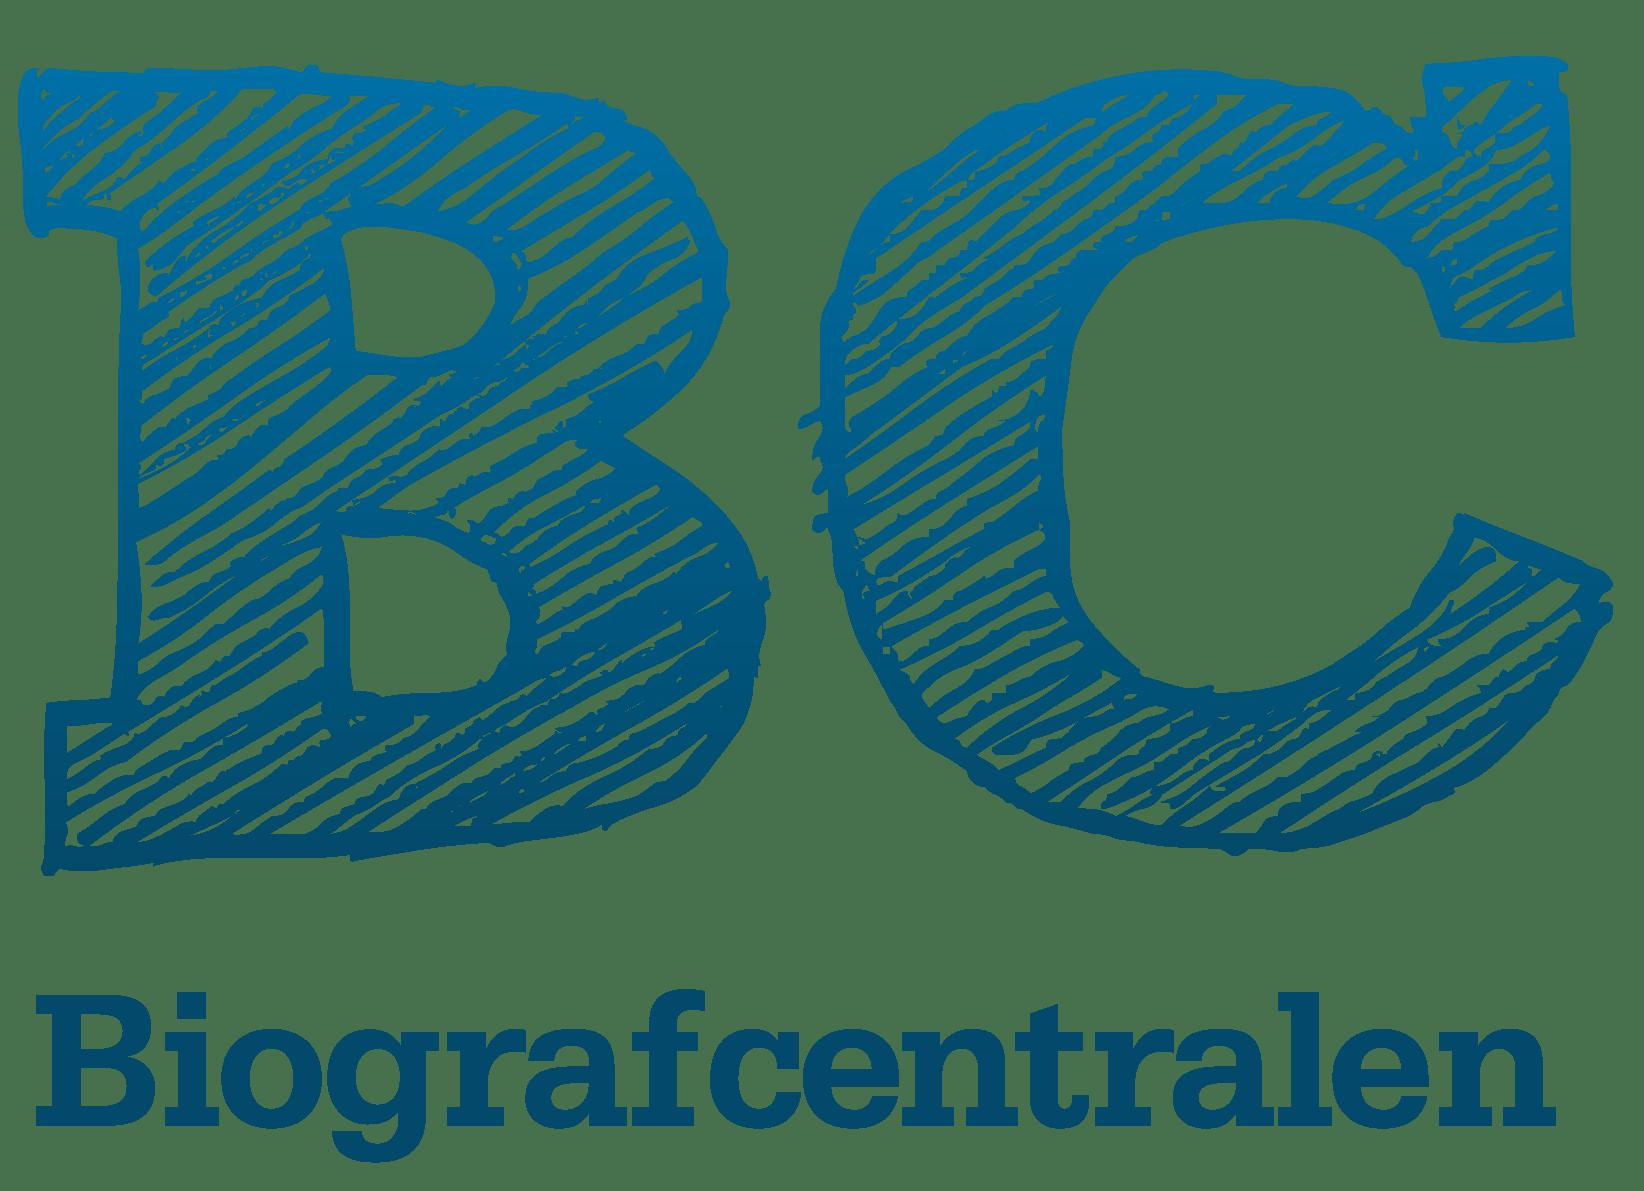 Biografcentralen